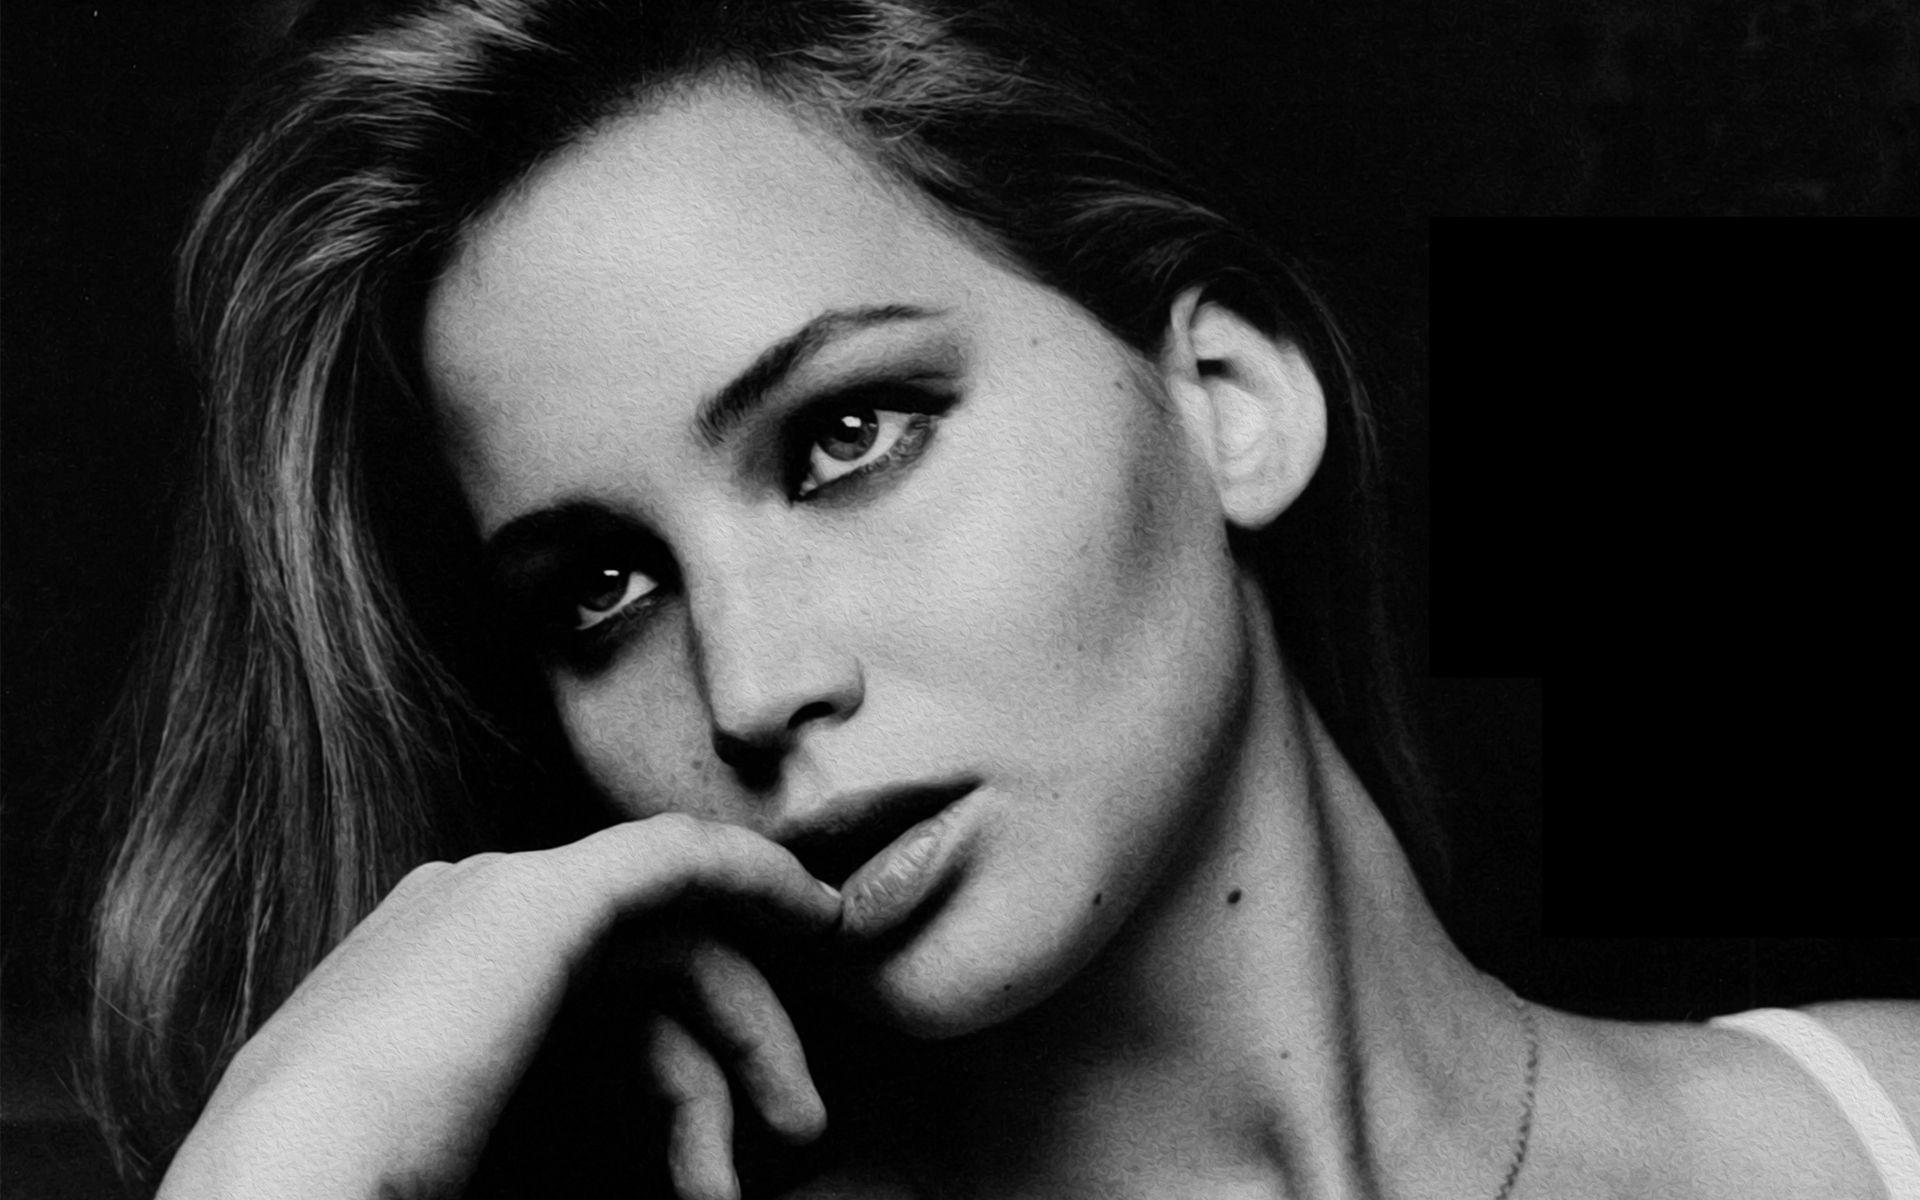 Jennifer Lawrence Wallpapers HD 9461 #12368 Wallpaper | Cool ...